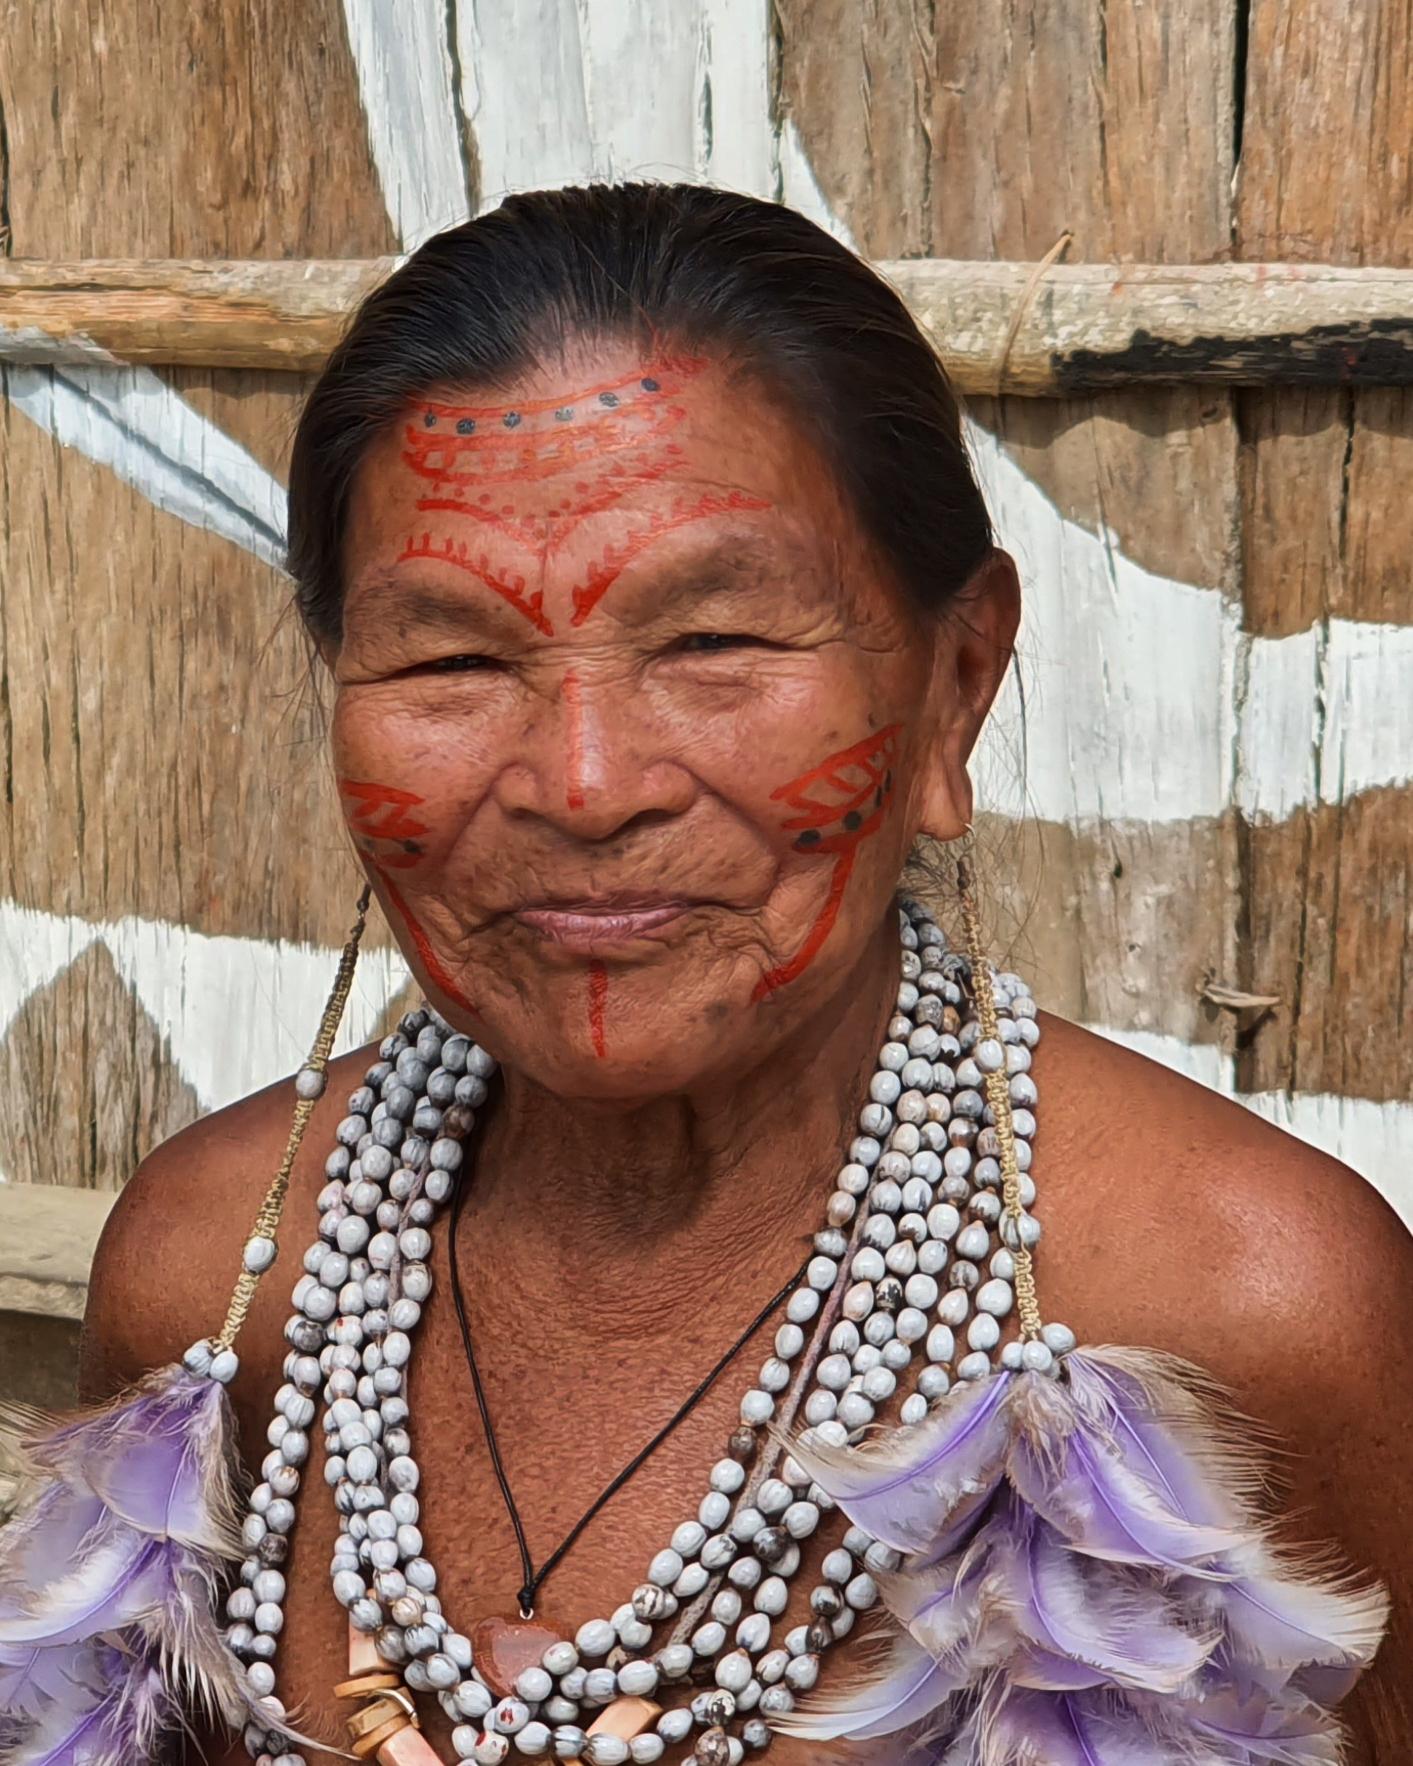 Indigenous woman in Amazon Rainforest